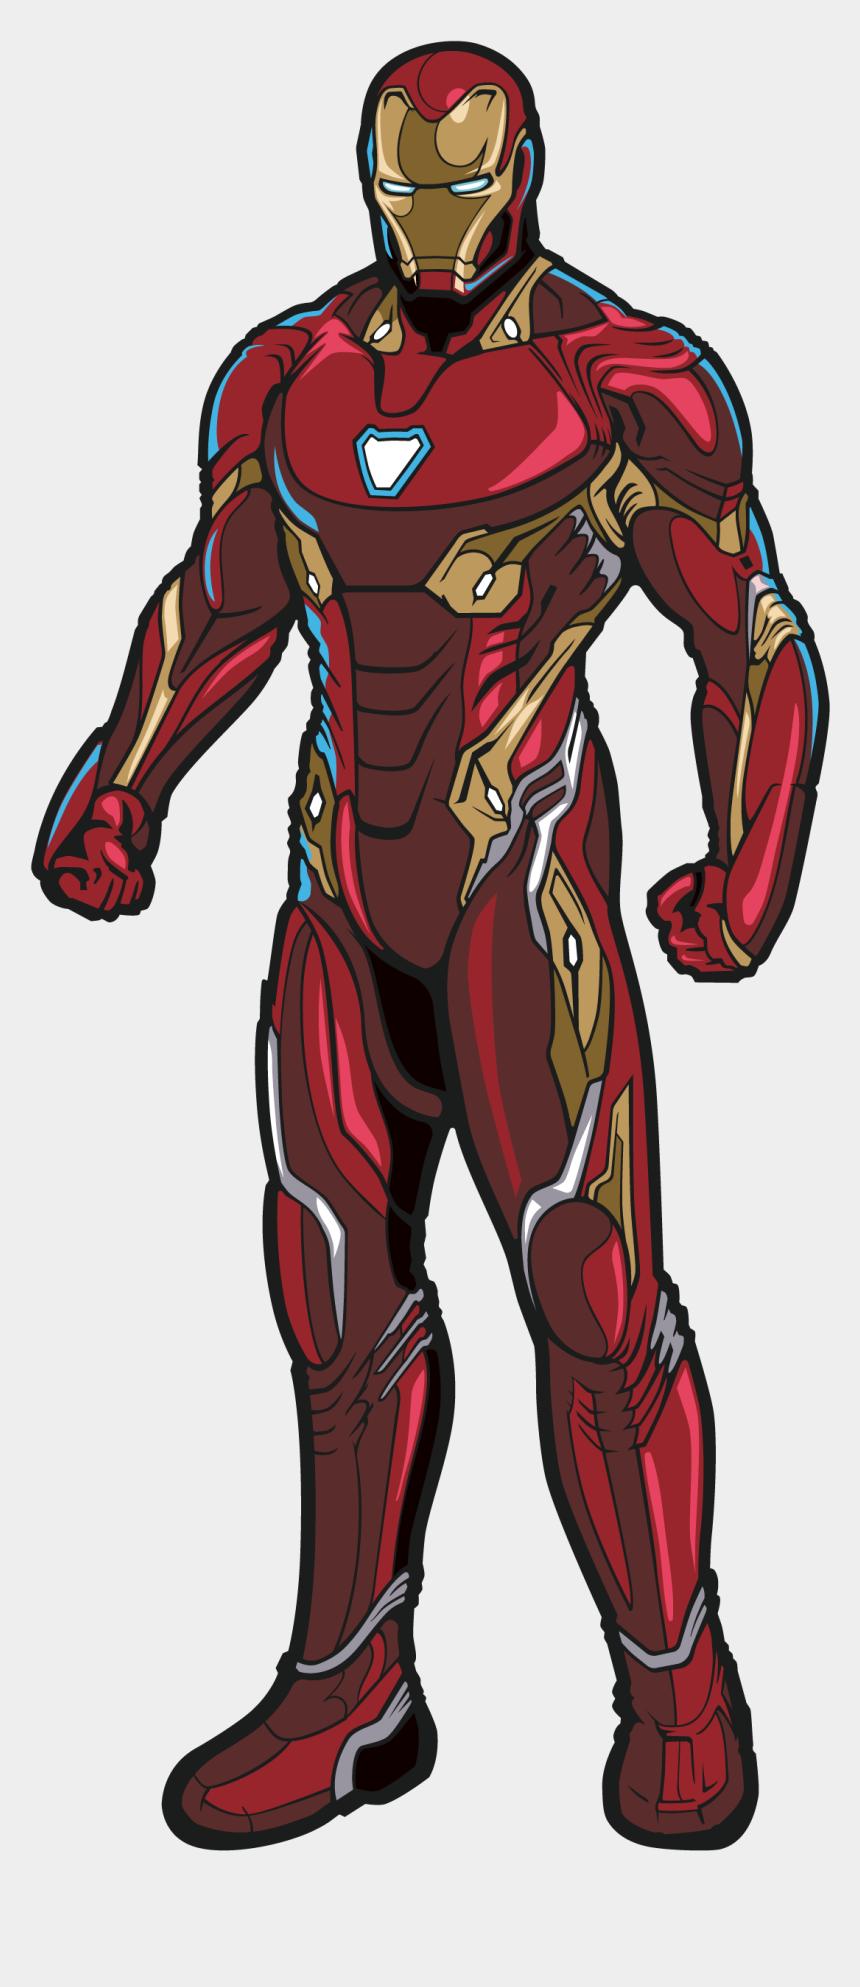 iron man clipart black and white, Cartoons - Iron Man - Iron Man Avengers Infinity War Figpin